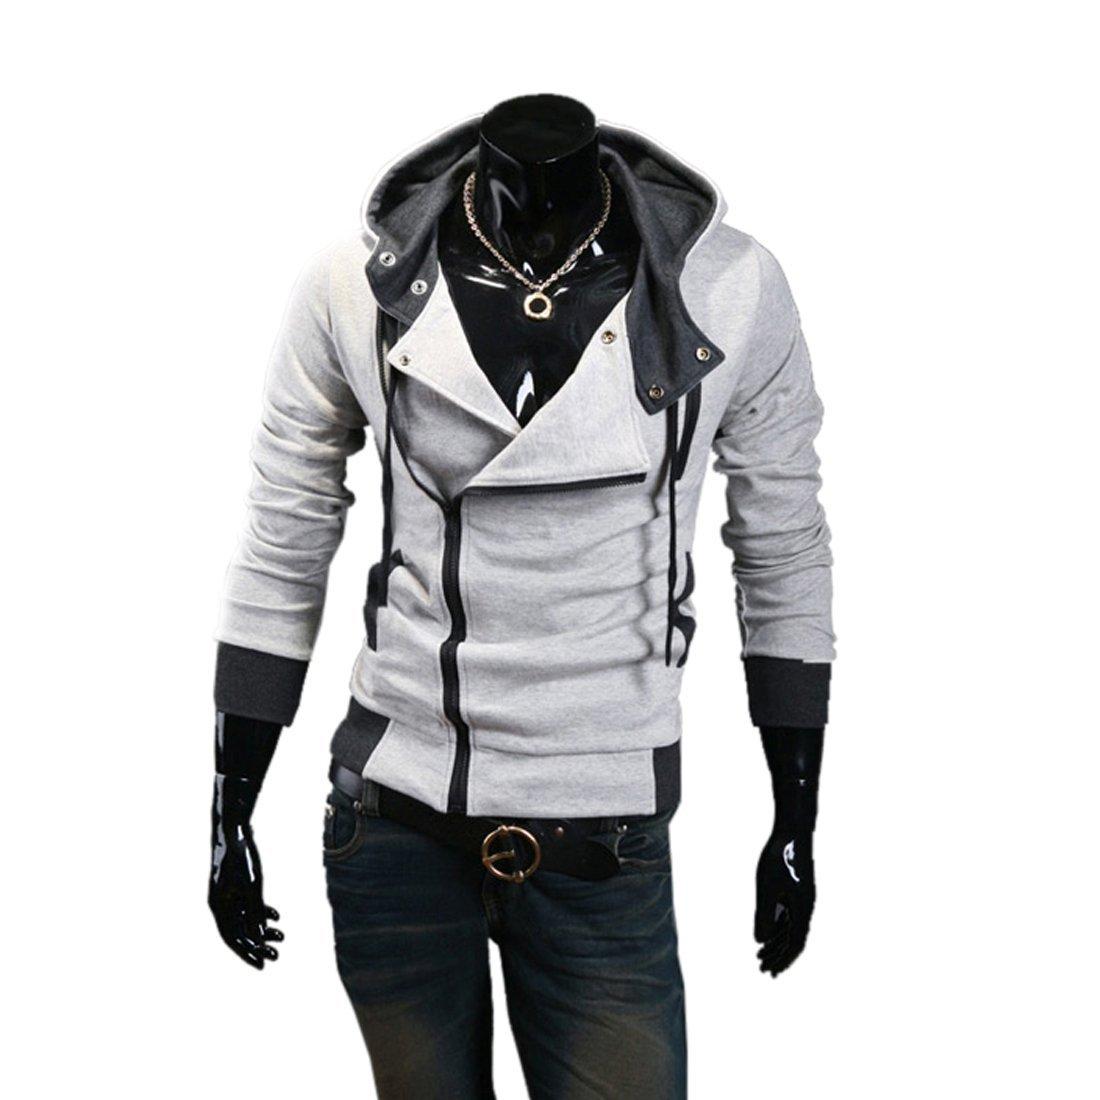 53c19d7708e New Hoodies Brand Men Sweatshirts Jackets Winter Fashion Sweatshirt Zipper  Design Men s Sportswear 4 Color M